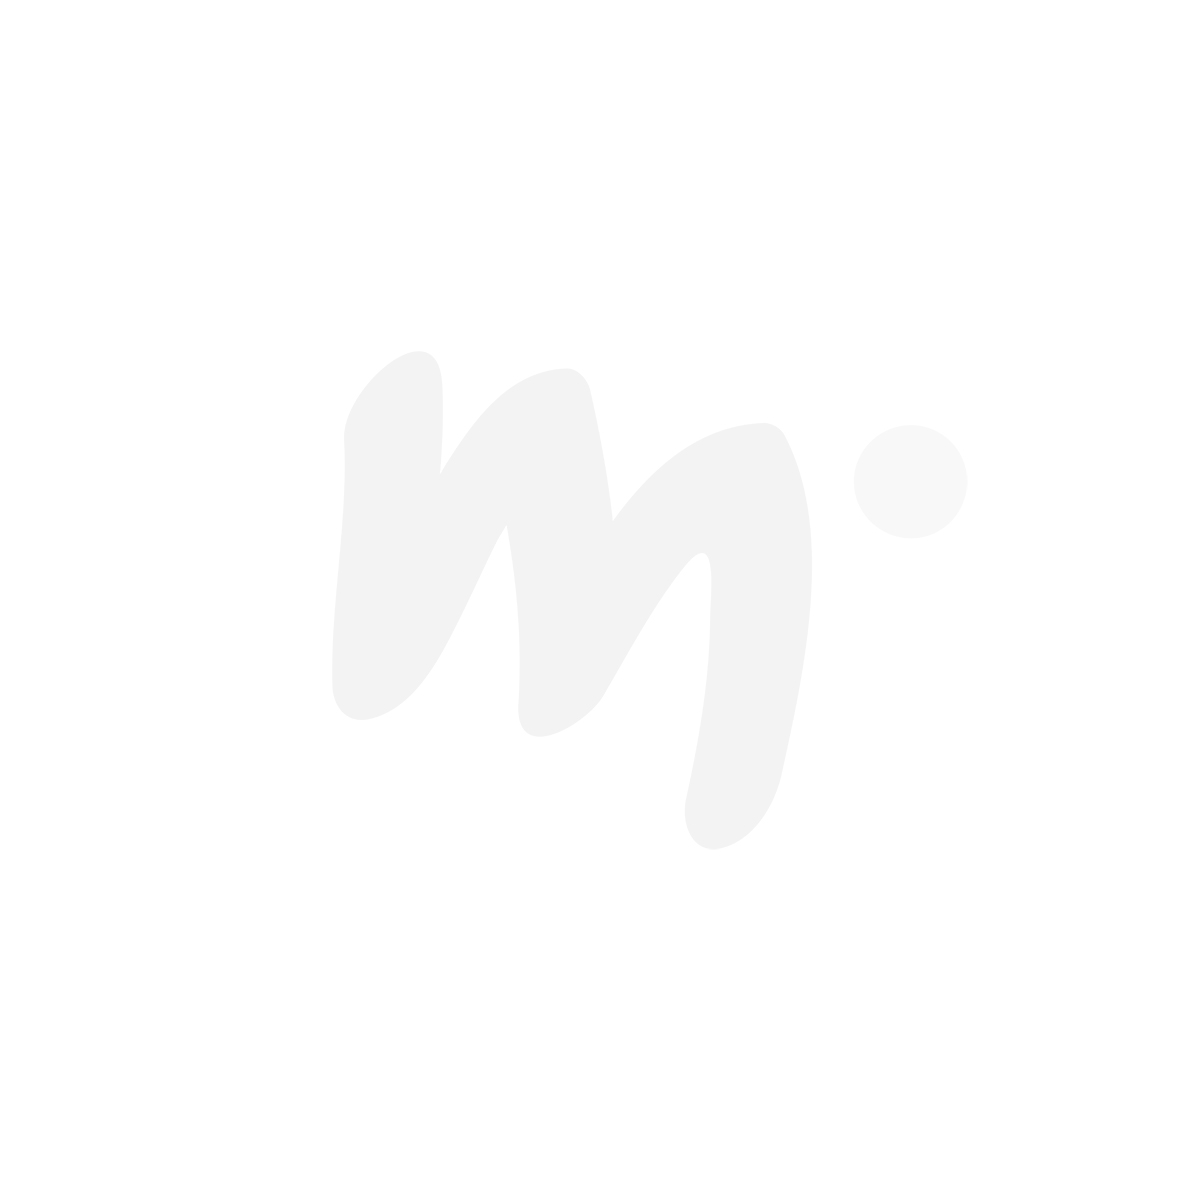 Moomin Moomintroll and Snorkmaiden Tumbler Set